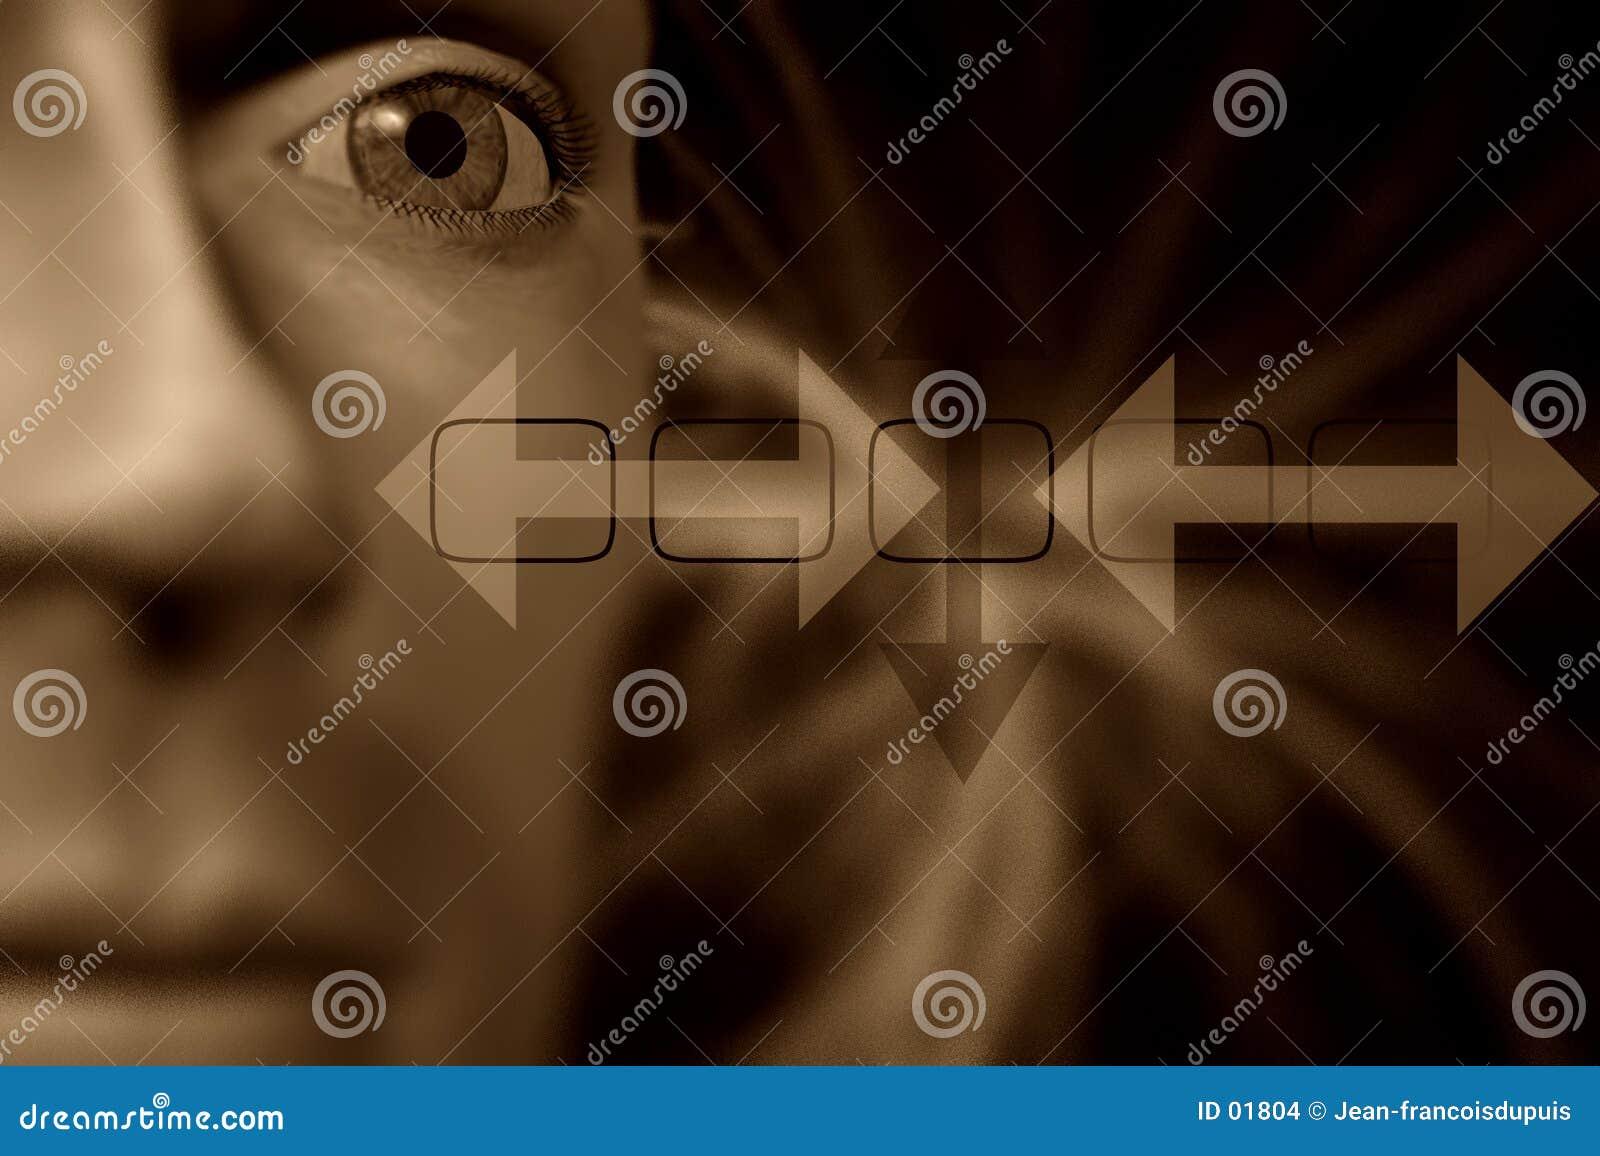 Pista humana, ojo en foco